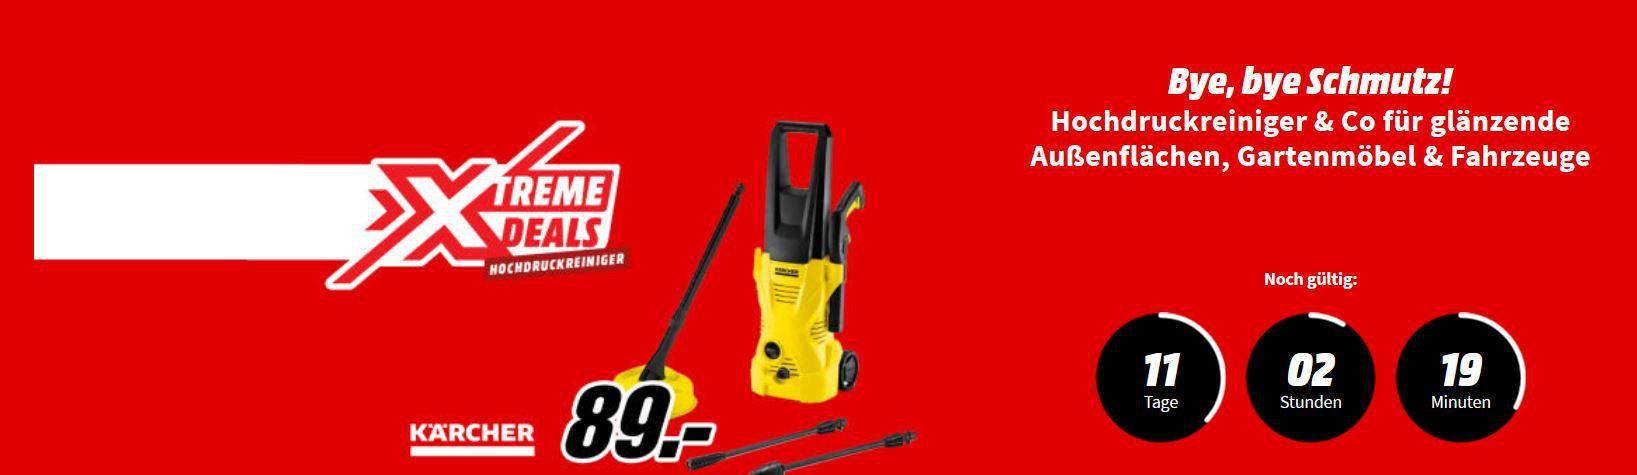 Media Markt beste Angebote & Aktionen: z.B CAMPINGAZ Gasgrill Master 4 Series Woody EX ab 389 statt 999€